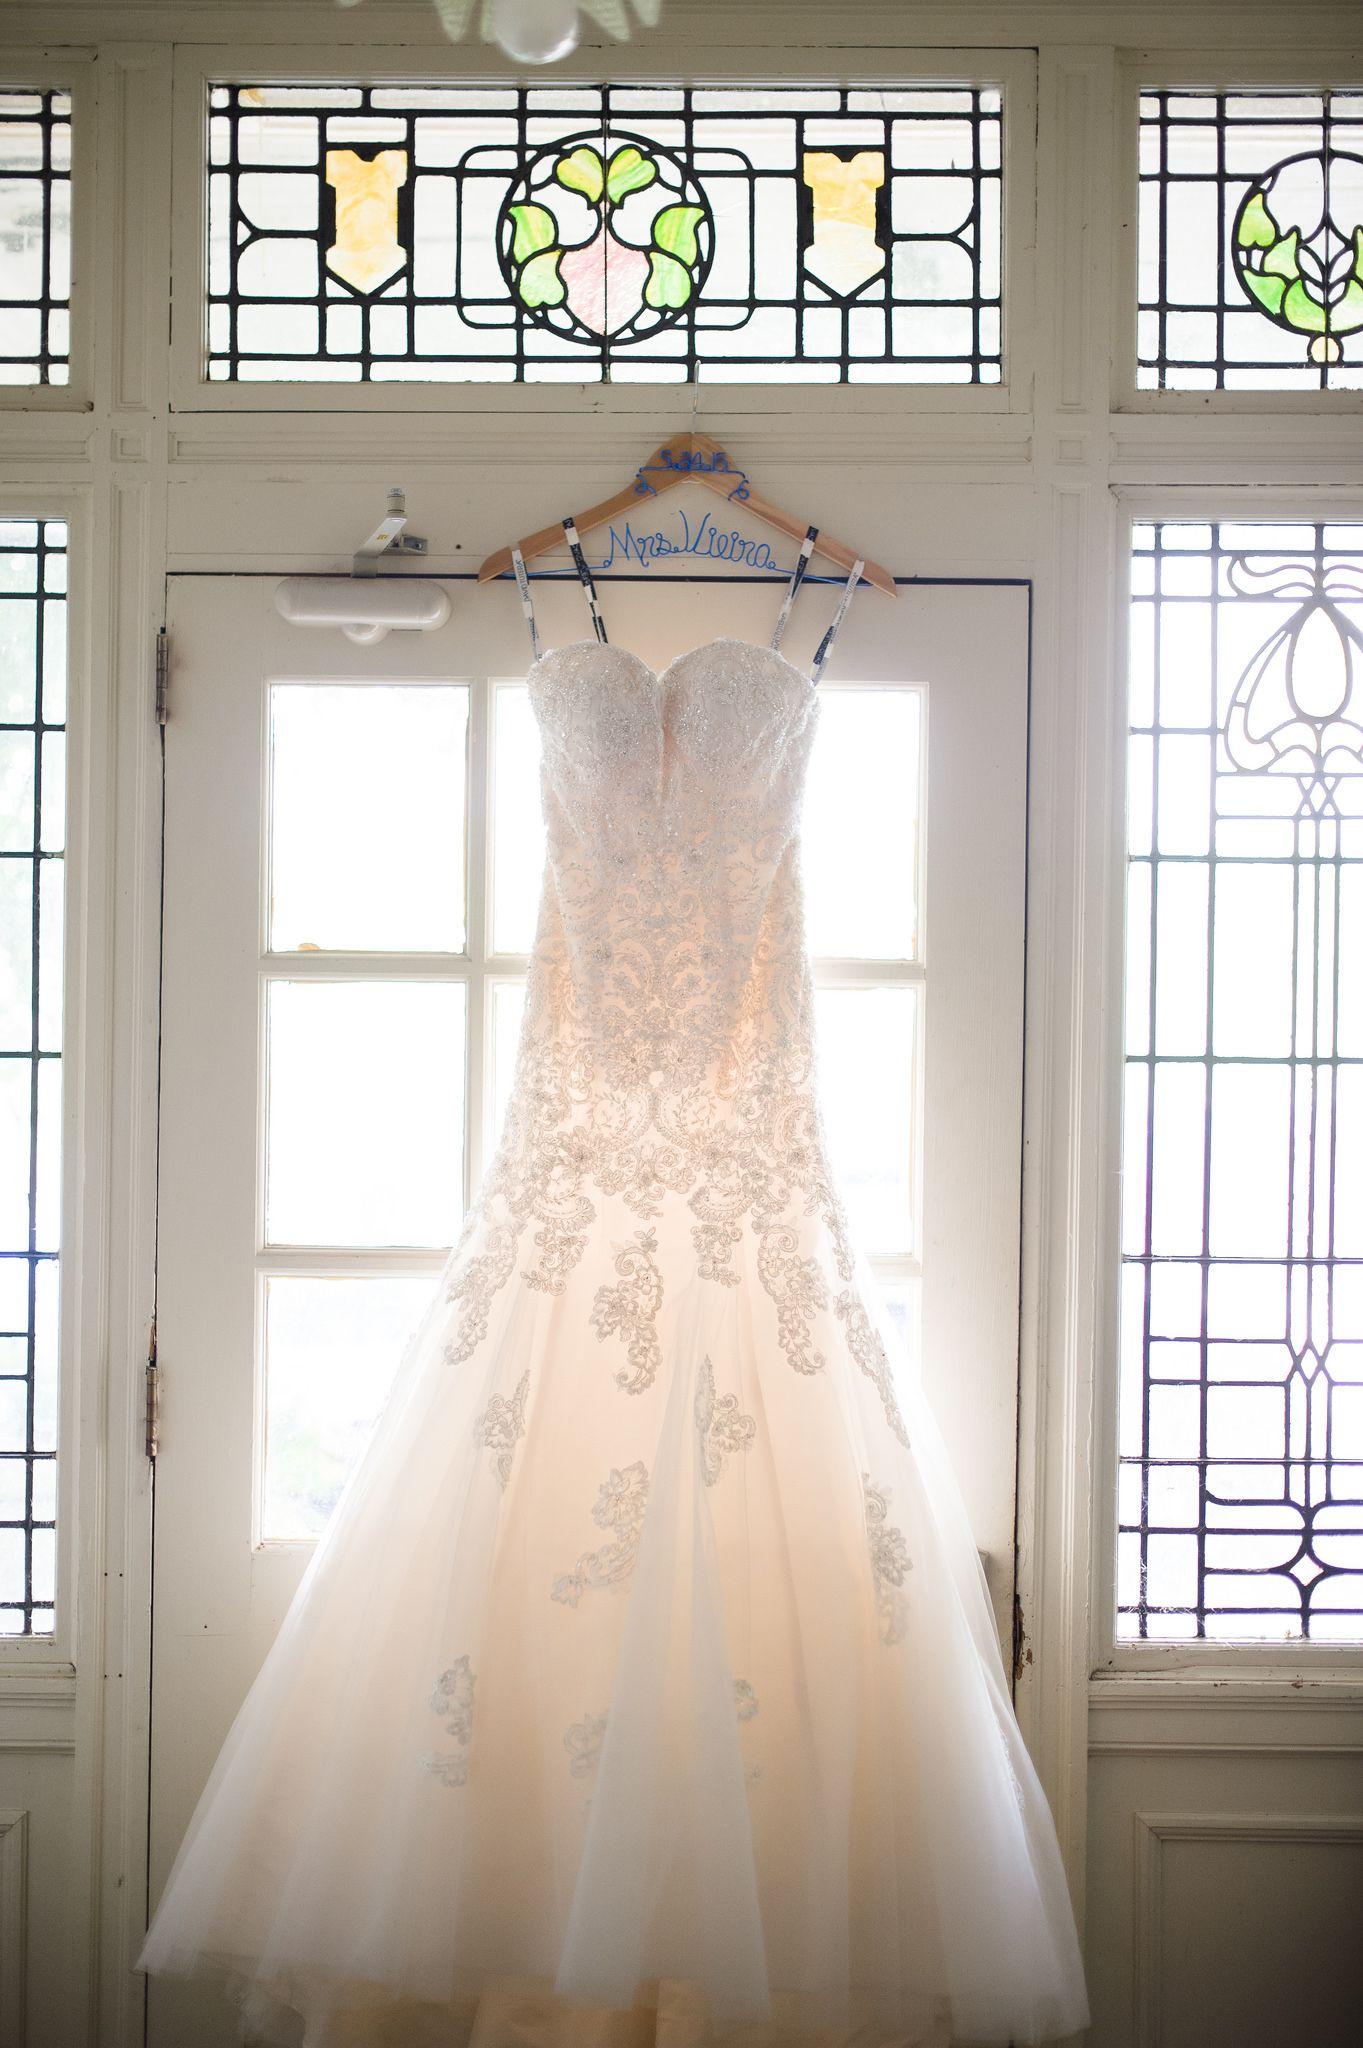 41a1a056614 Strapless Hand-Beaded Lace Trumpet Wedding Dress- 114293 Beryl ...